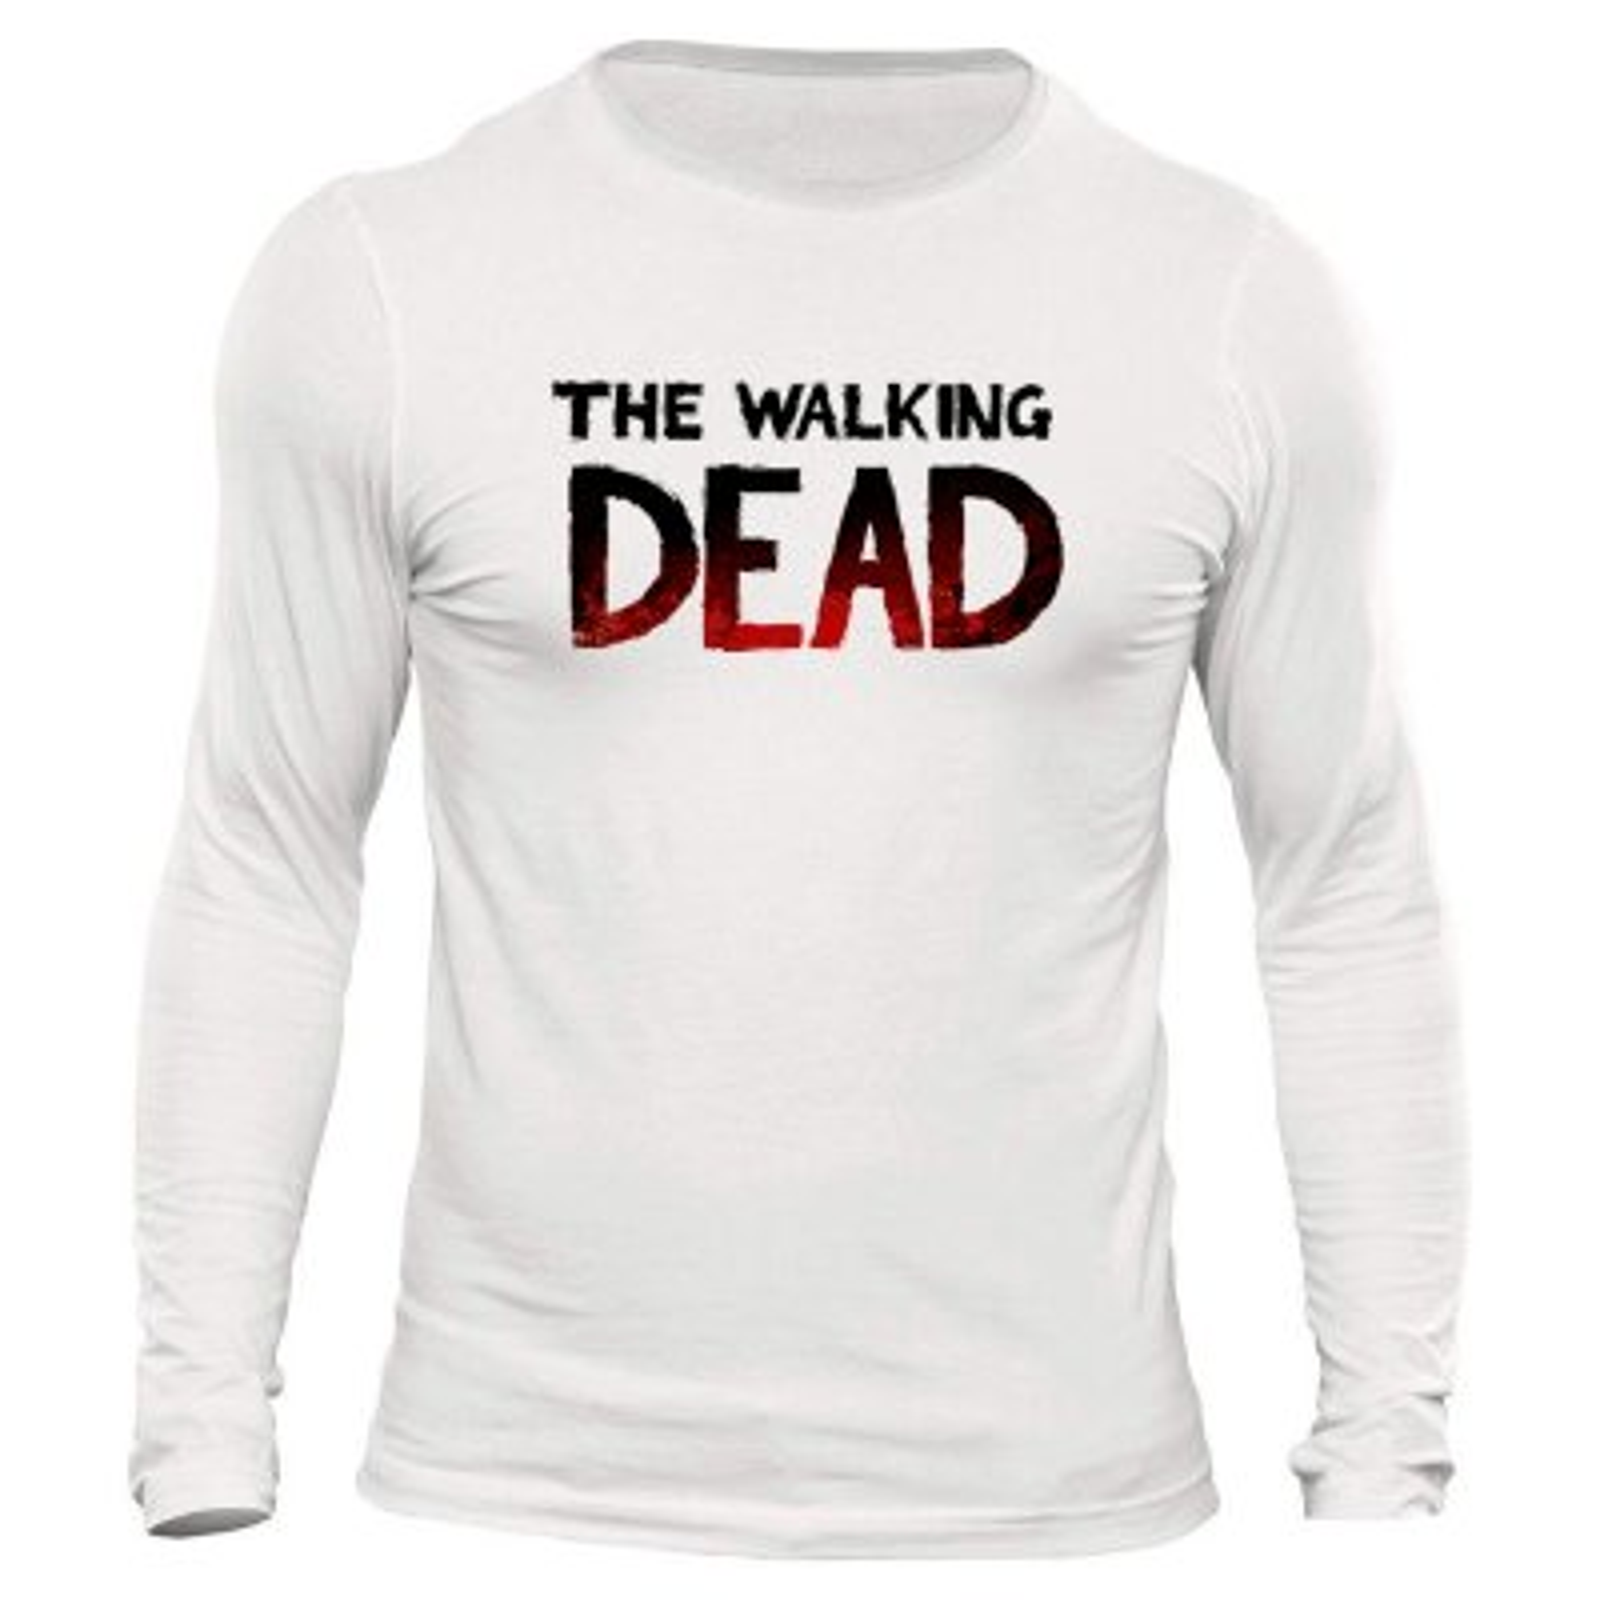 تصویر تیشرت آستین بلند مردانه طرح walking dead کد 1083